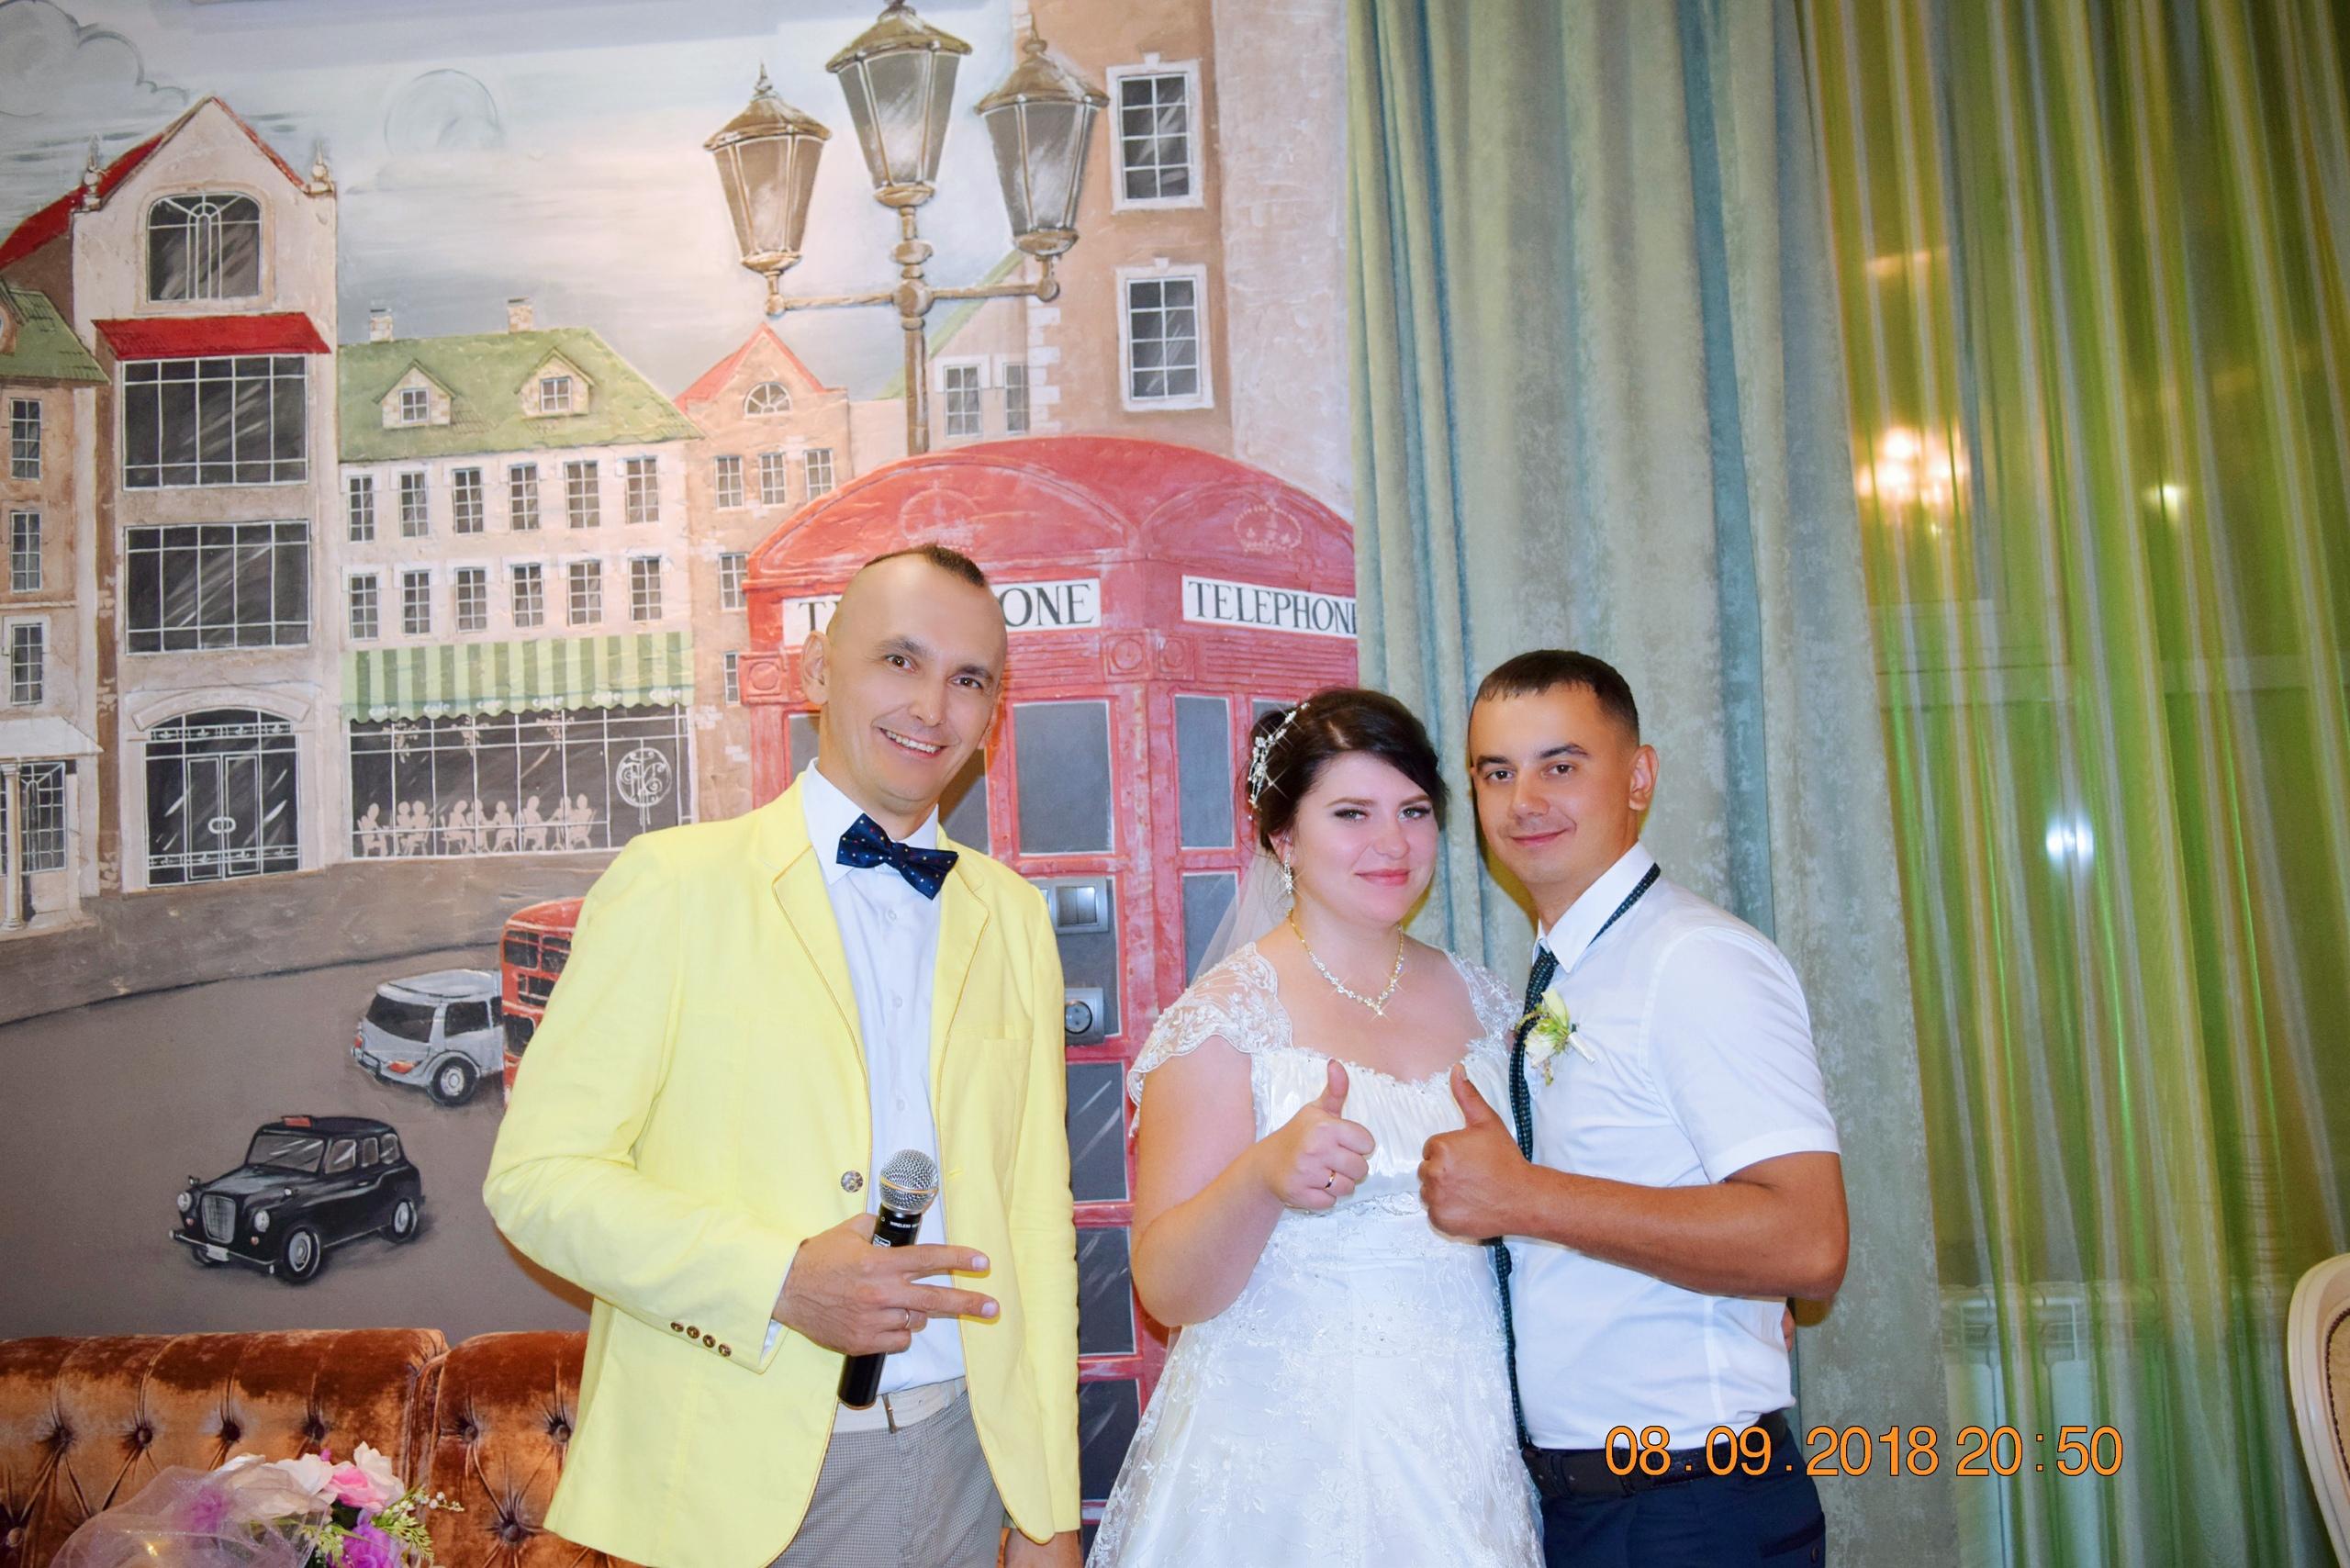 zFrwaI4E Is - Свадьба Константина и Анны